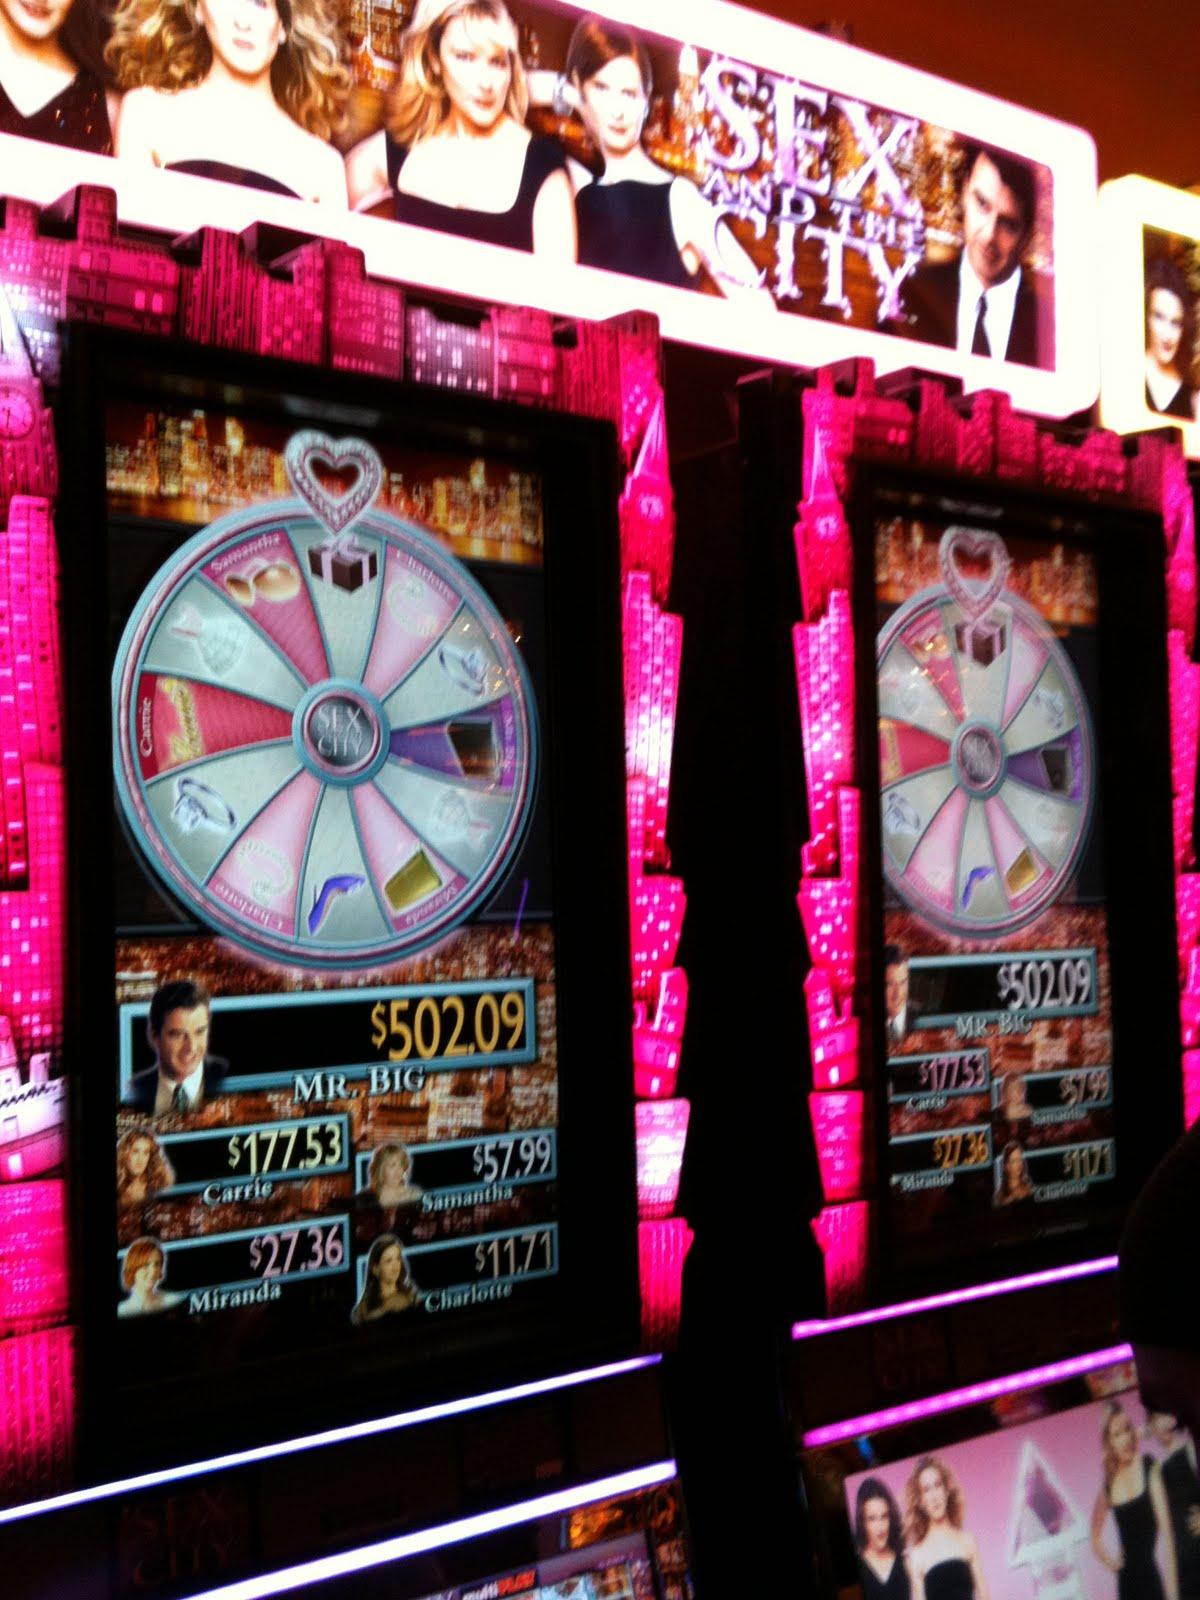 Wisconsin gambling machines sports gambling online best sites